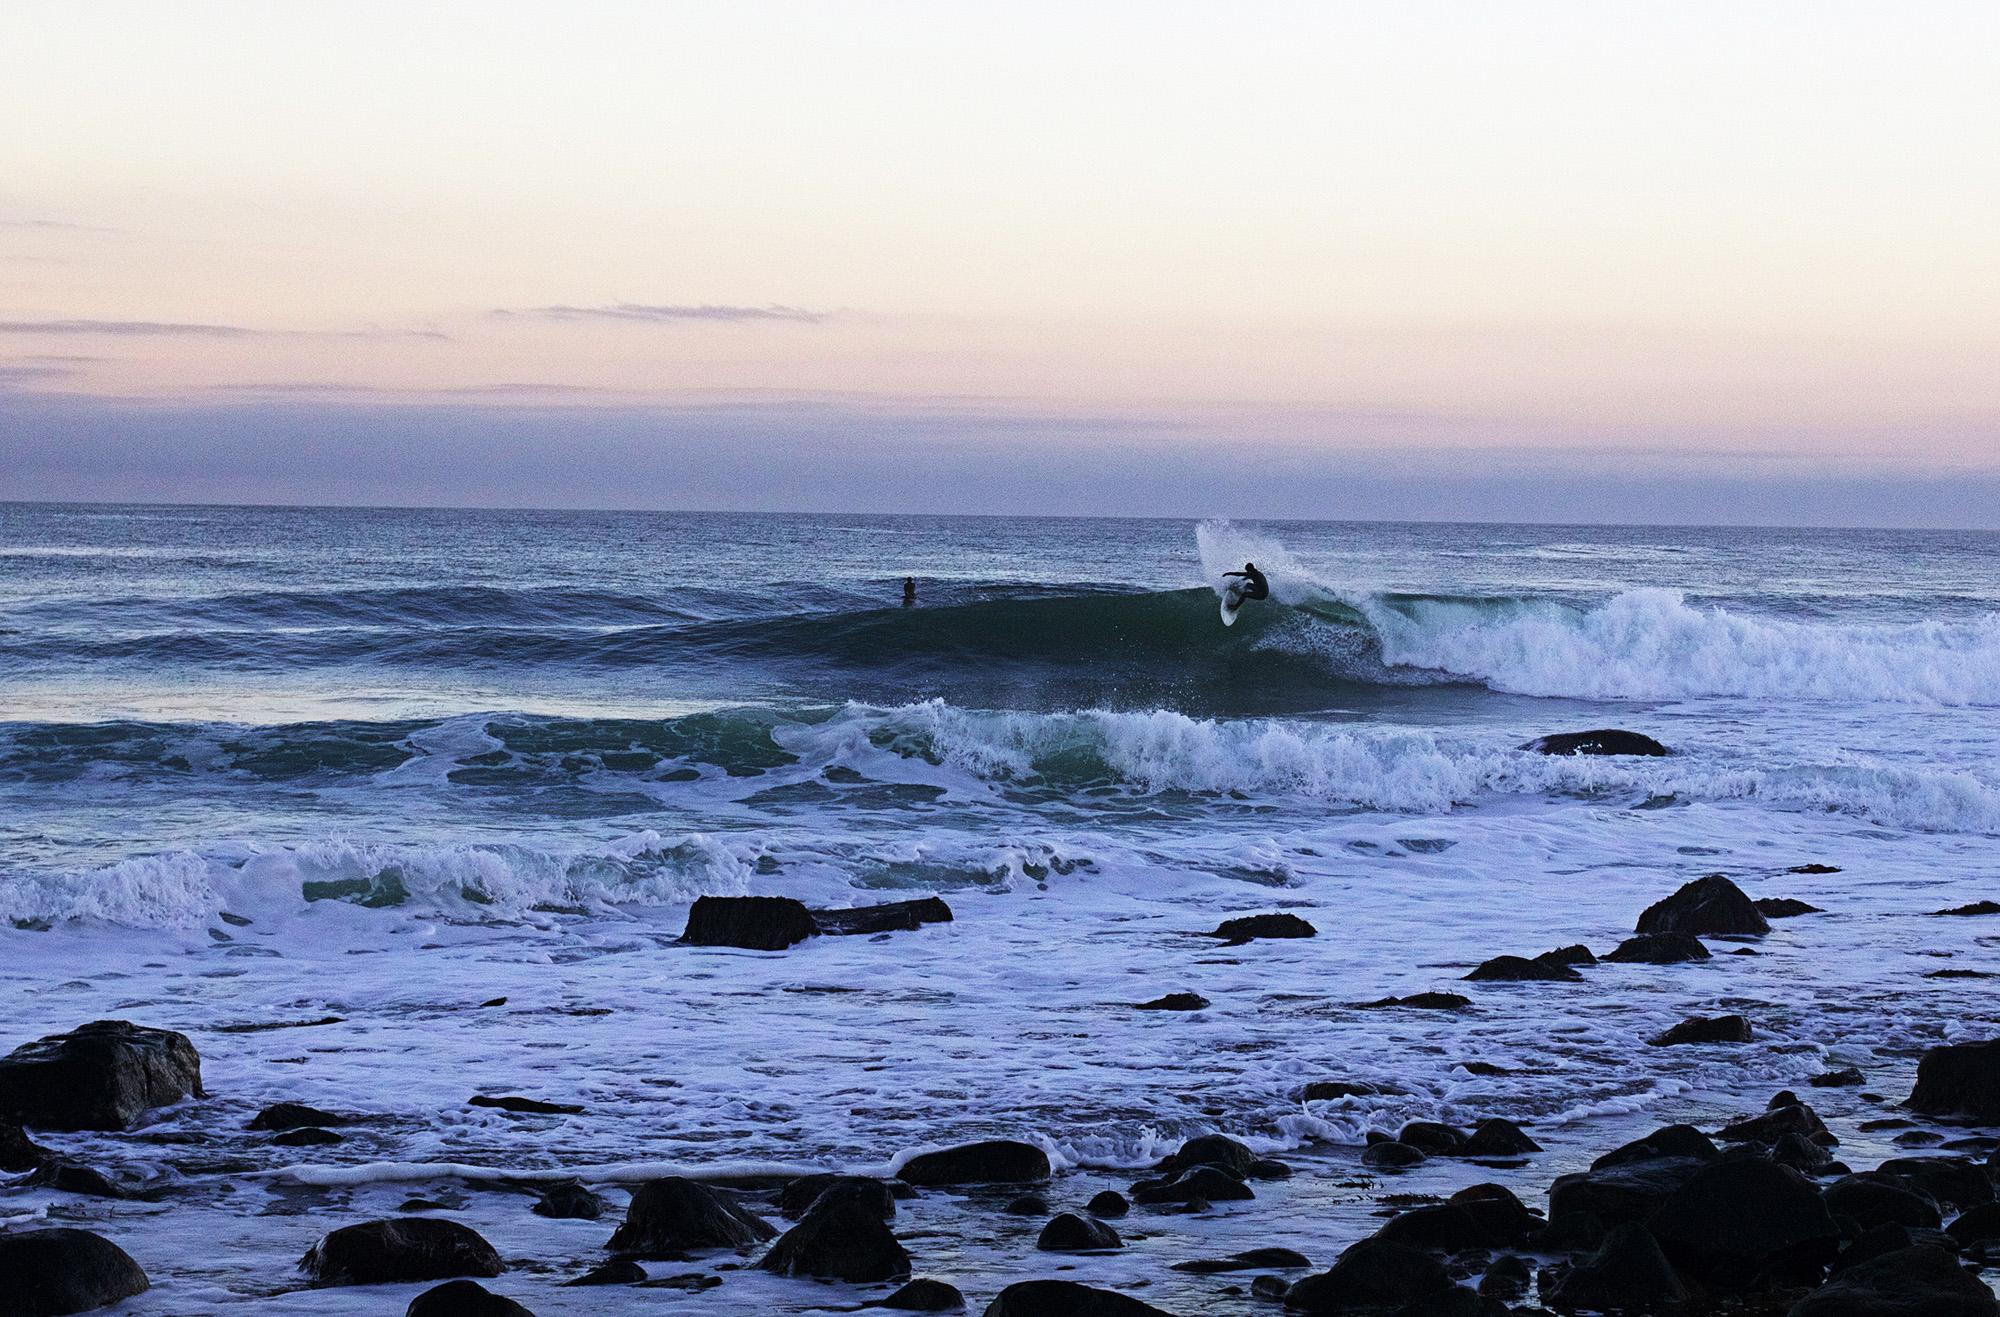 1-19-17 MTK Surfer 3.jpg